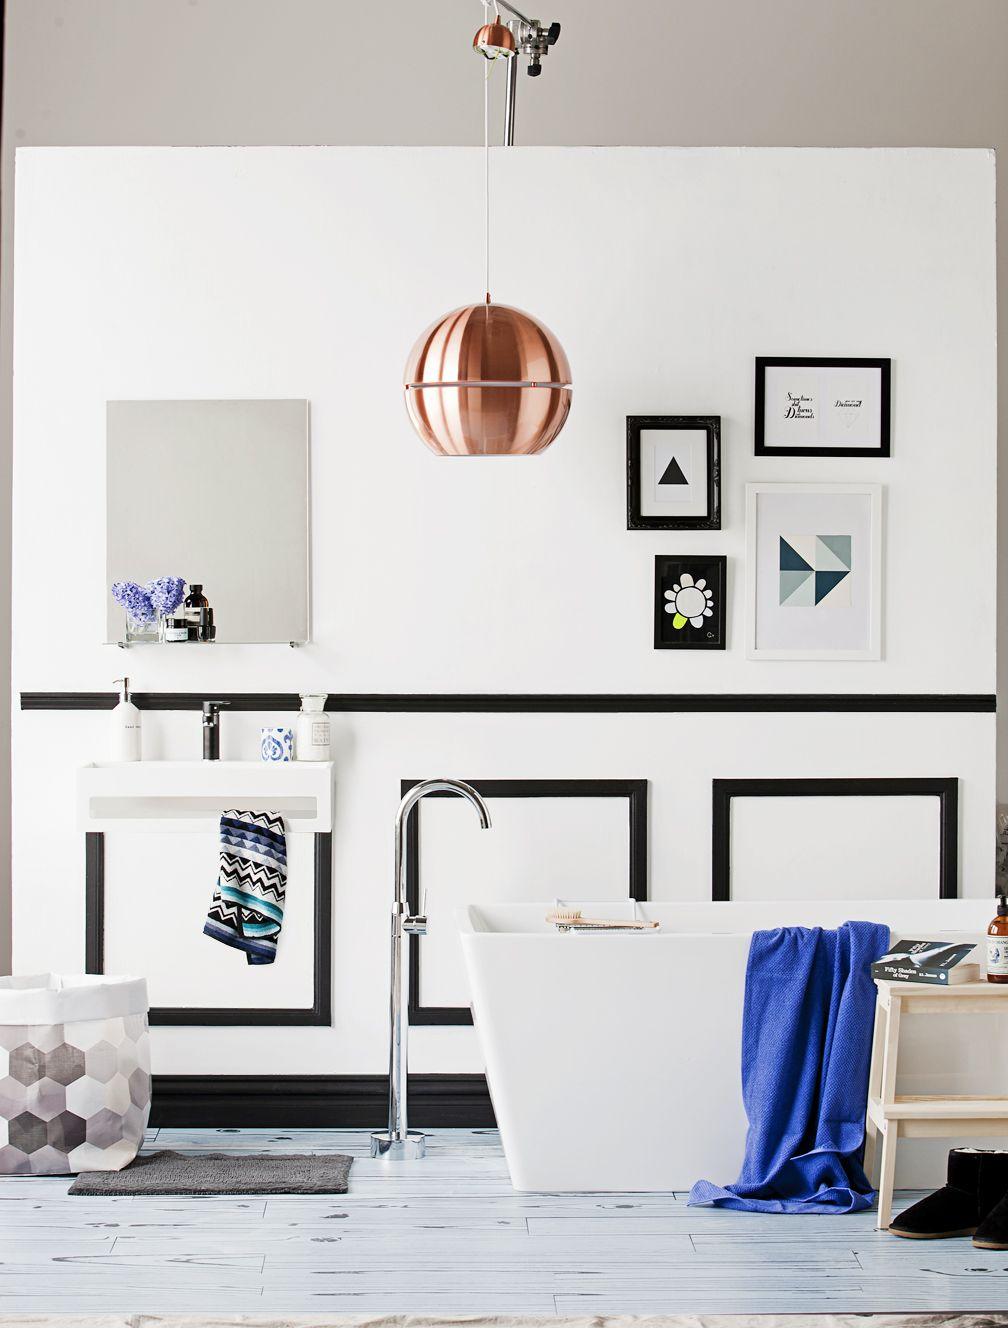 Modern bathroom blue color schemes - Cobalt Copper Black White Bathroom